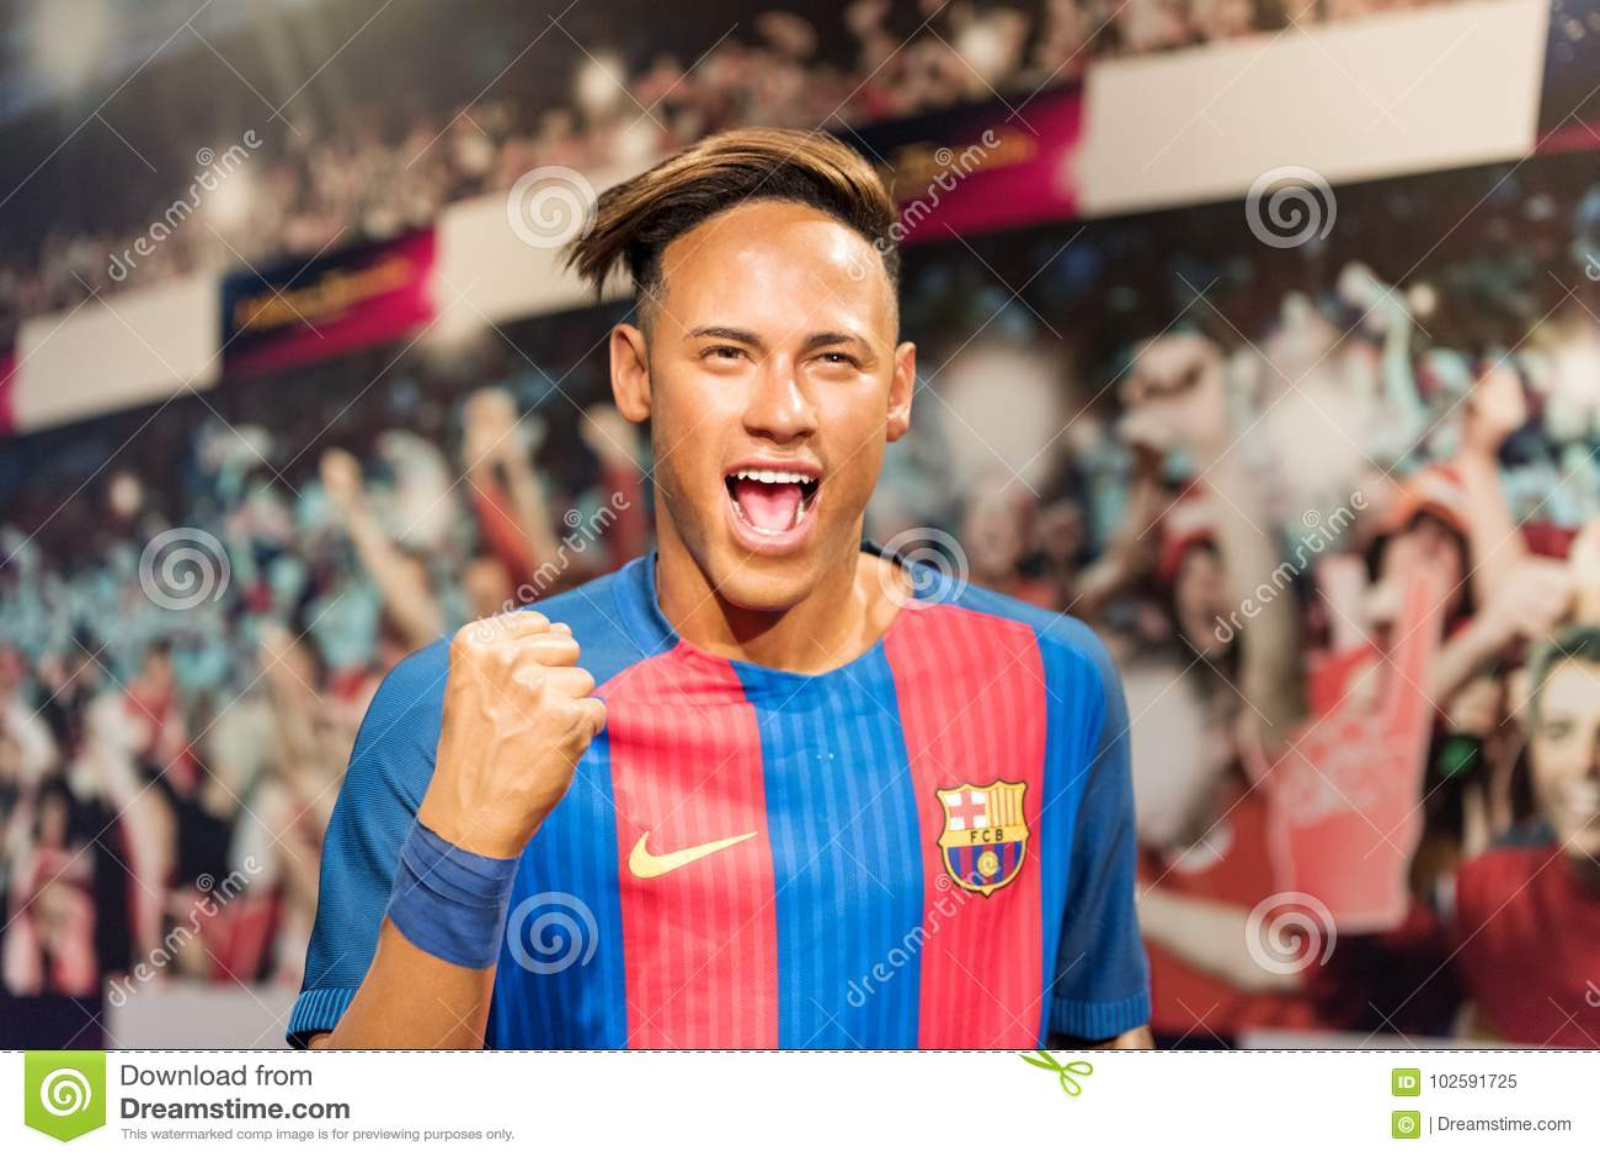 Brasiliansk fotbollsspelareNeymar junior